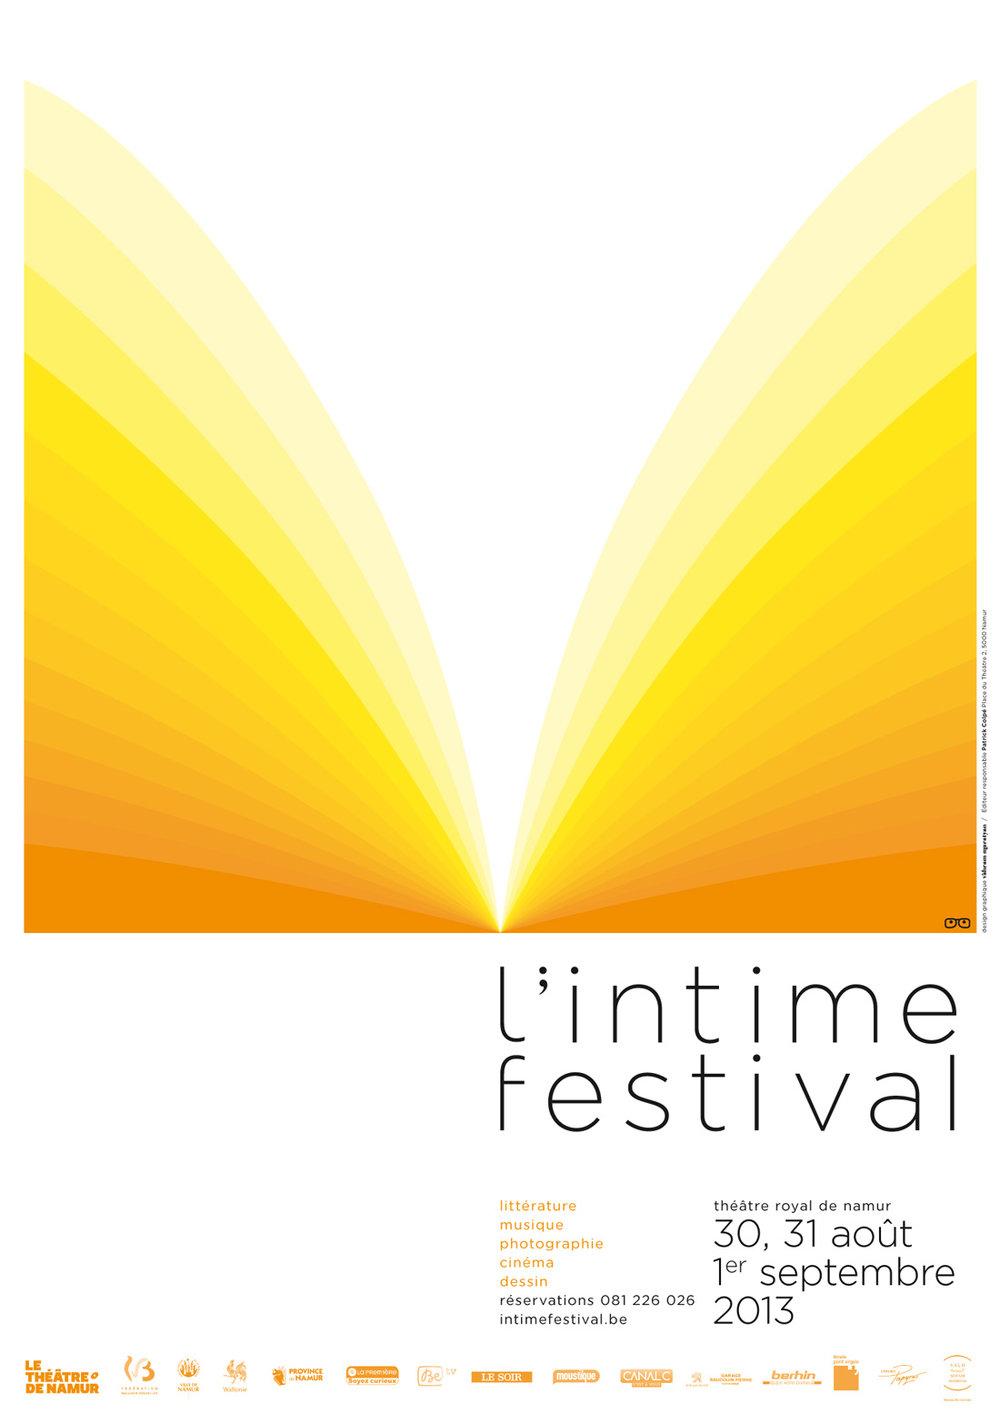 L'intime festival. Literary festival print.